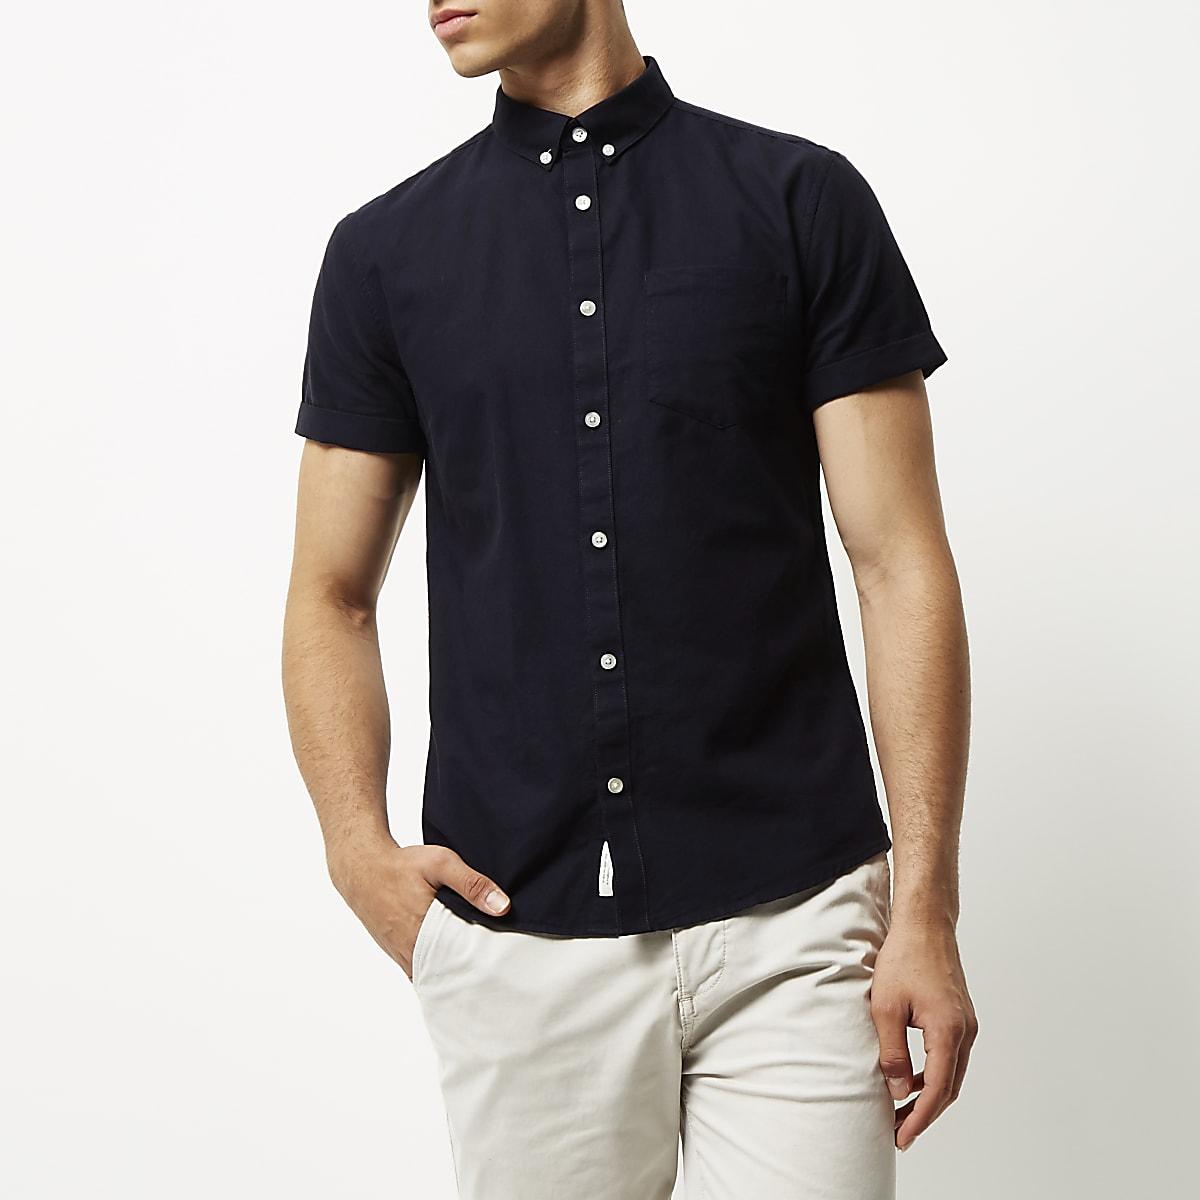 Navy slim fit long sleeve Oxford shirt